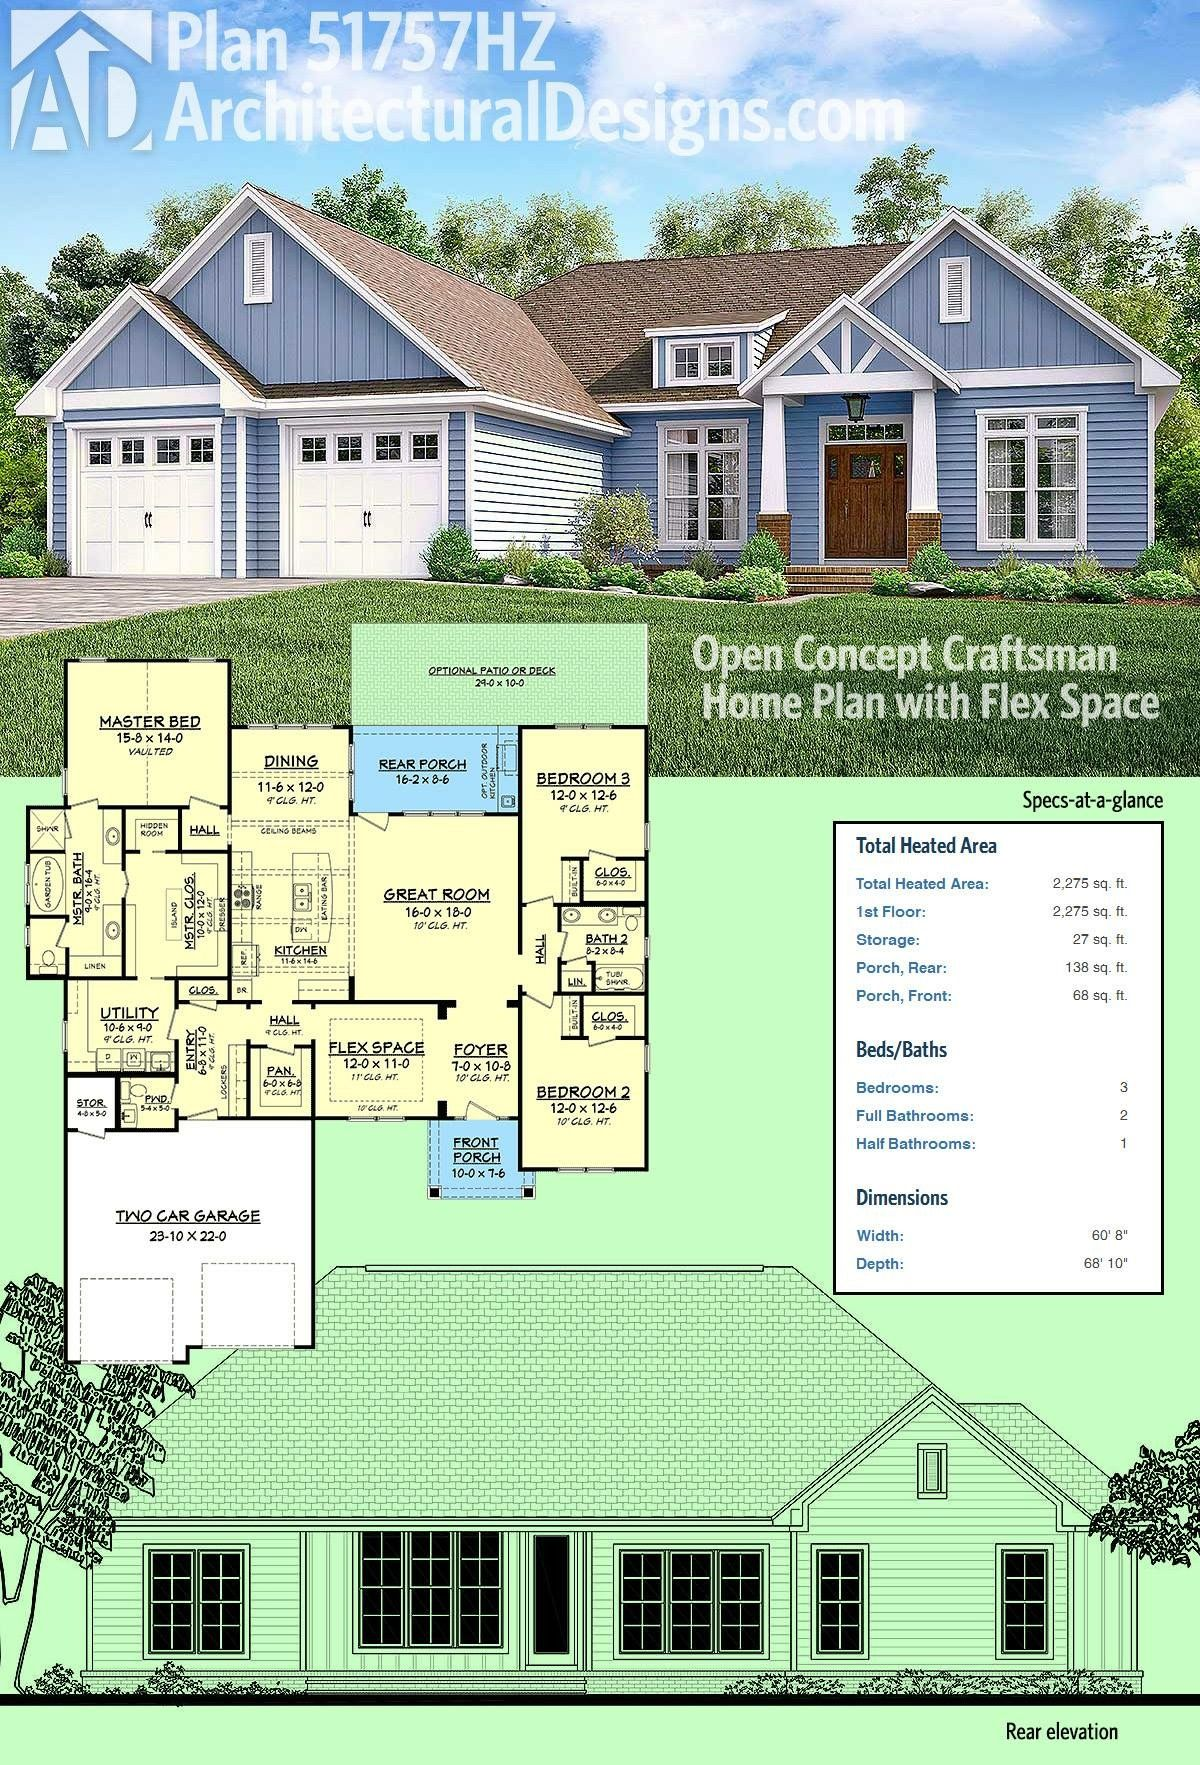 plan 51757hz open concept craftsman home plan with flex space